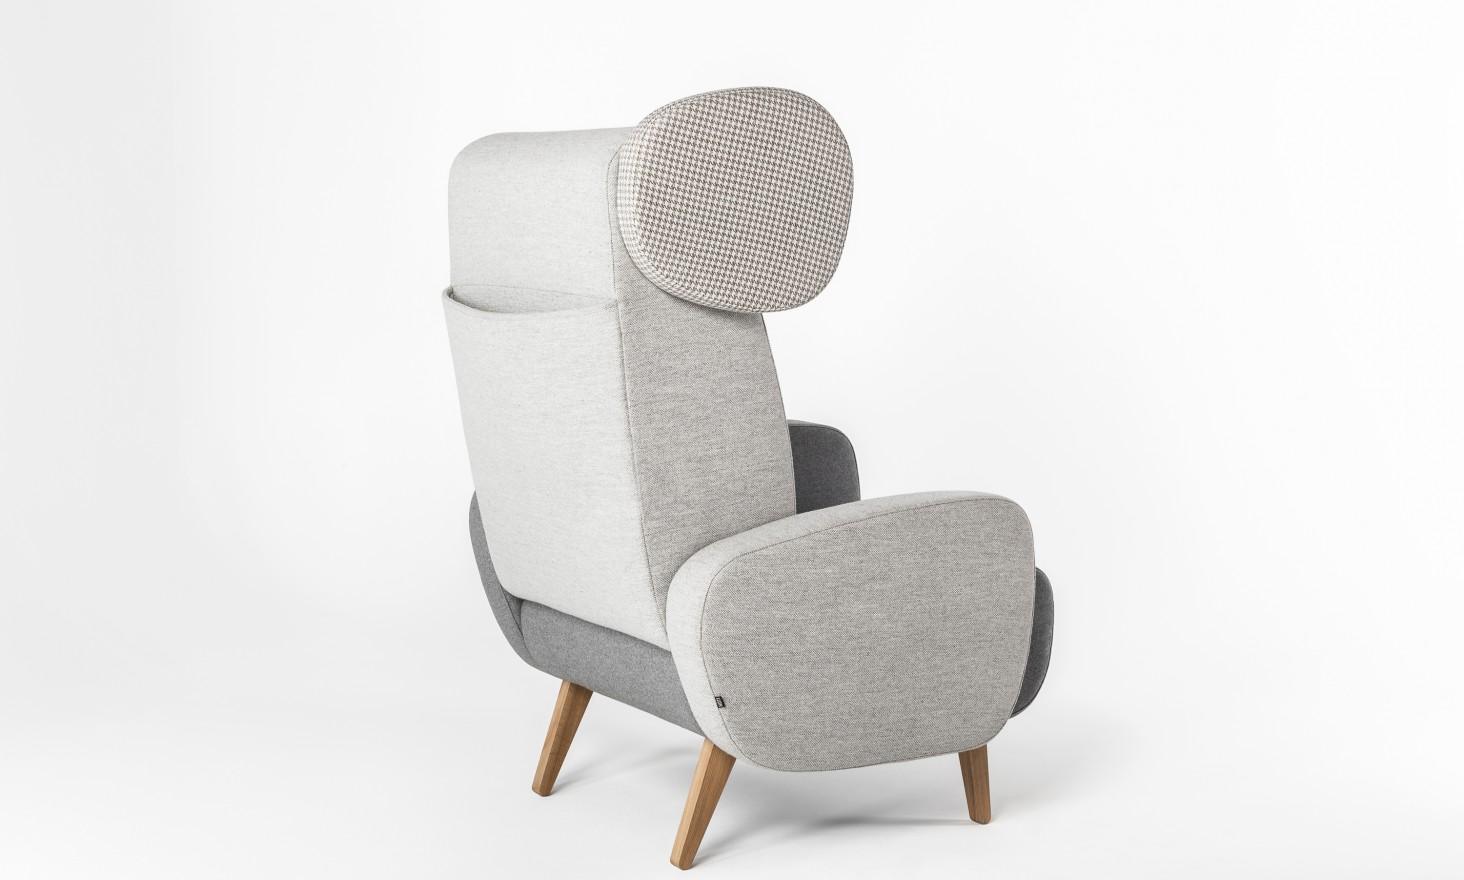 TEDDY_BEAR_packshot_armchair 4